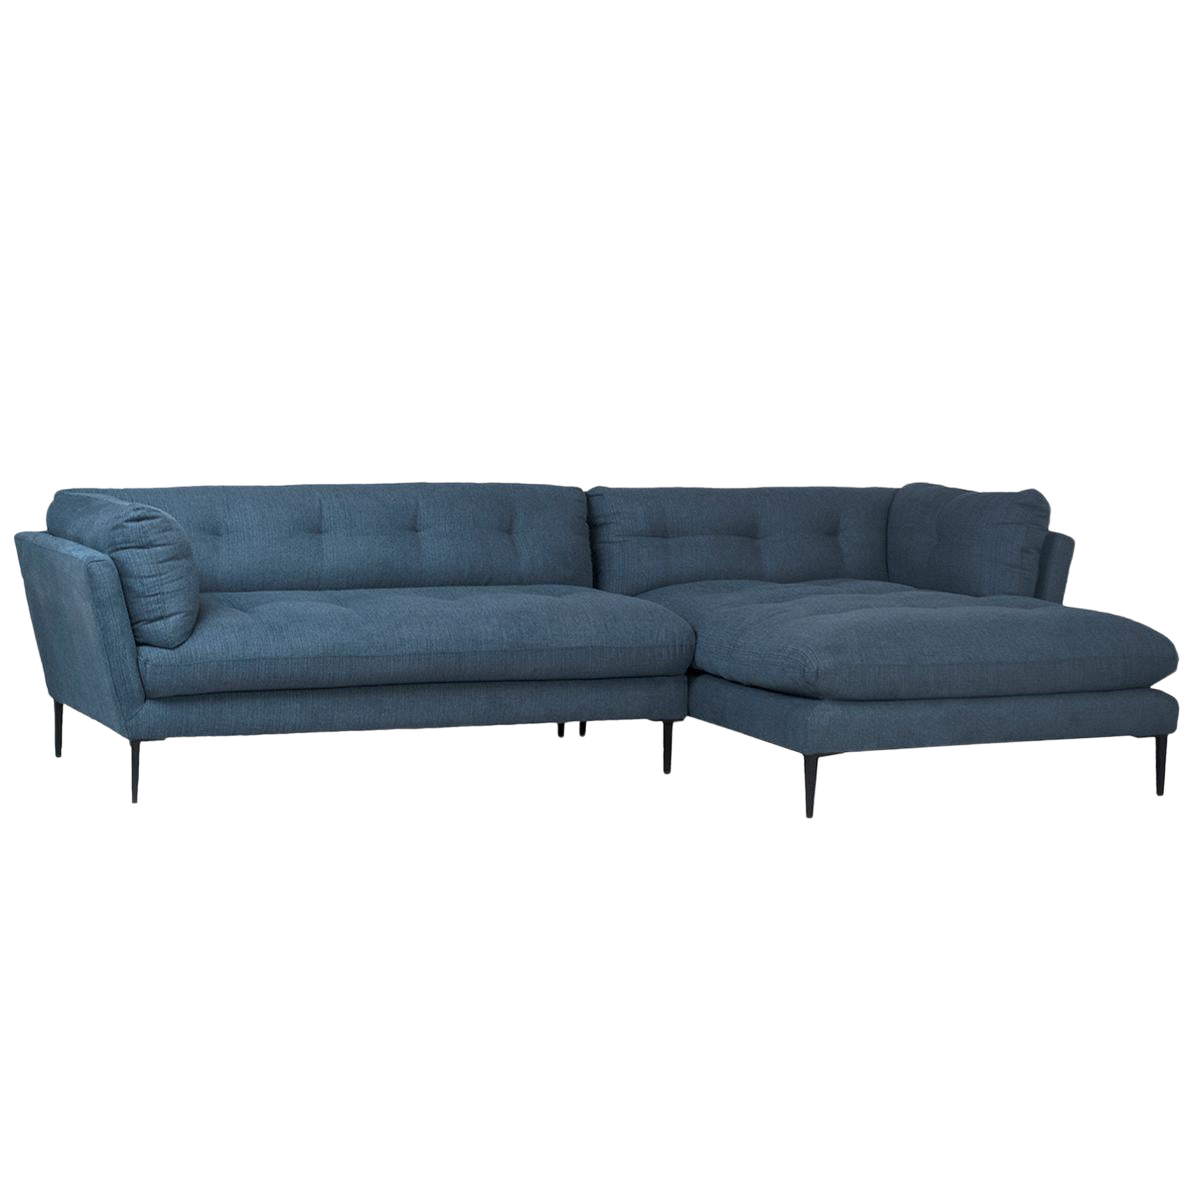 Pleasing Midcentury Blue Chaise Sofa Ncnpc Chair Design For Home Ncnpcorg